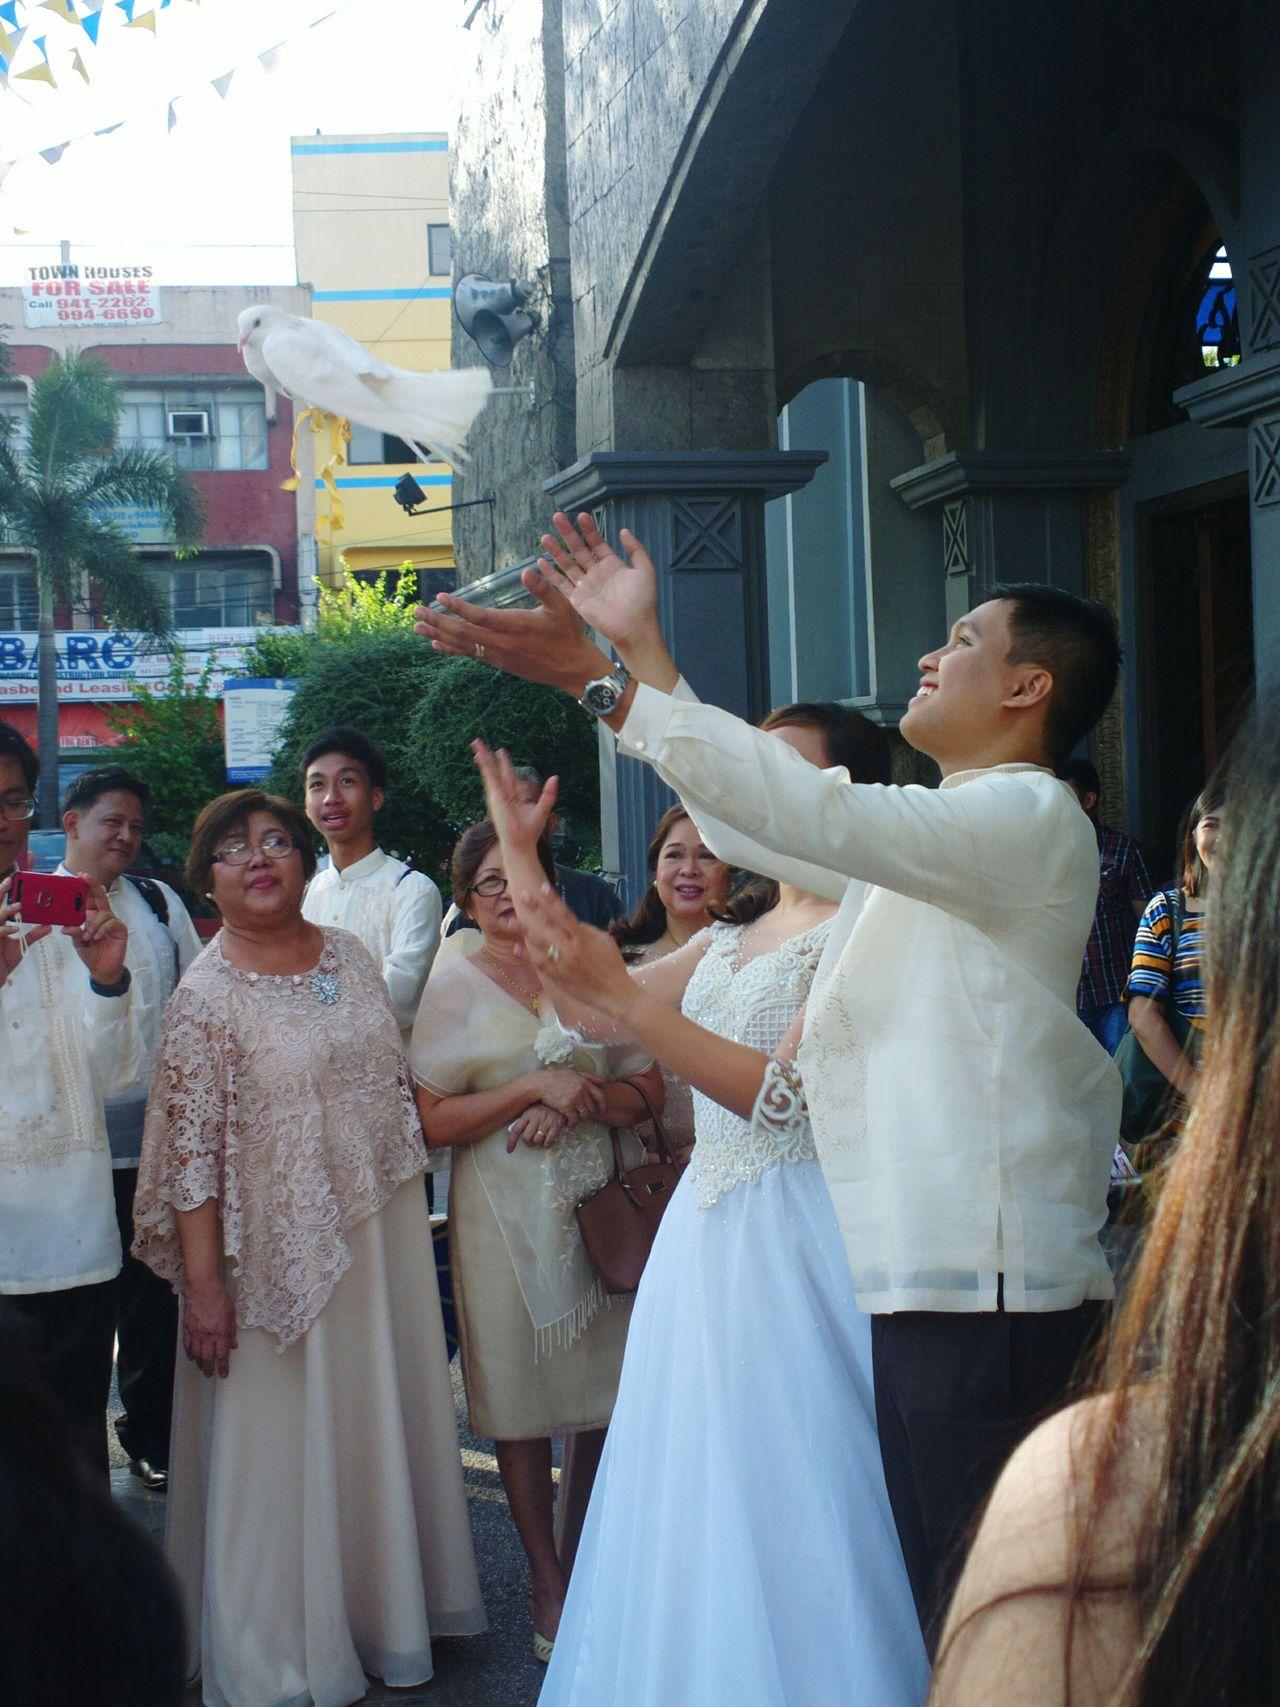 Bride Newlyweds Groom EyeEmNewHere Happy Moment Happy People Church Dream Comes True!